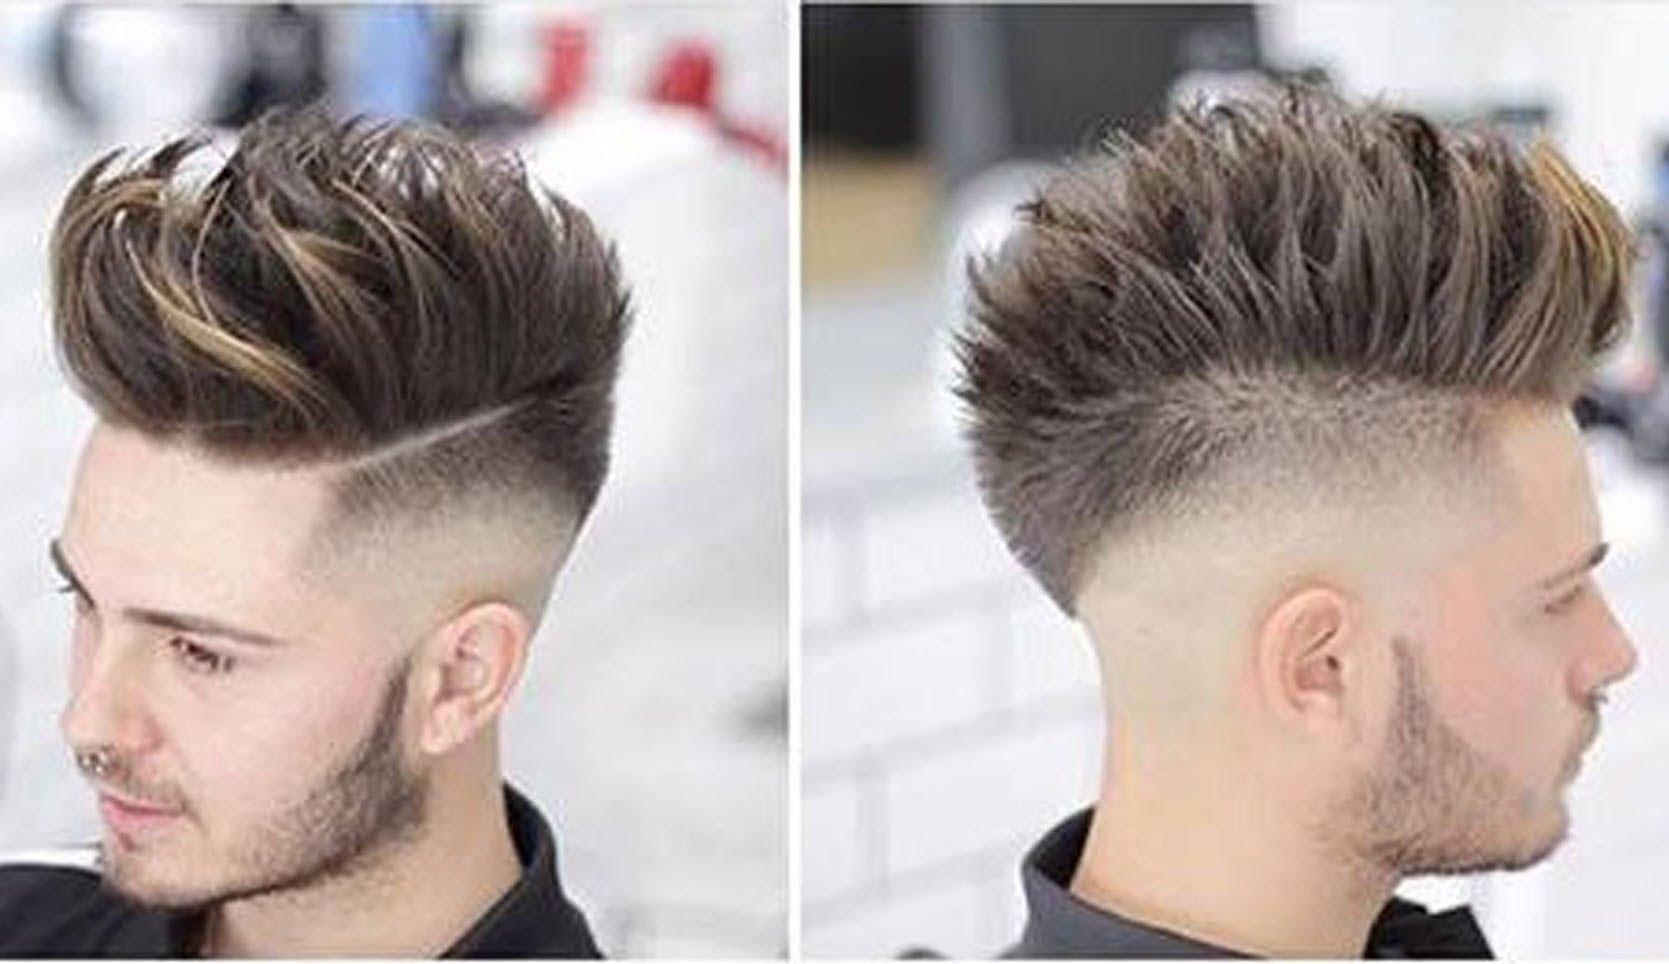 New Hairstyles For Mens 2016: قصات شعر شباب 2018 , اجدد قصات الشعر للشباب 2018